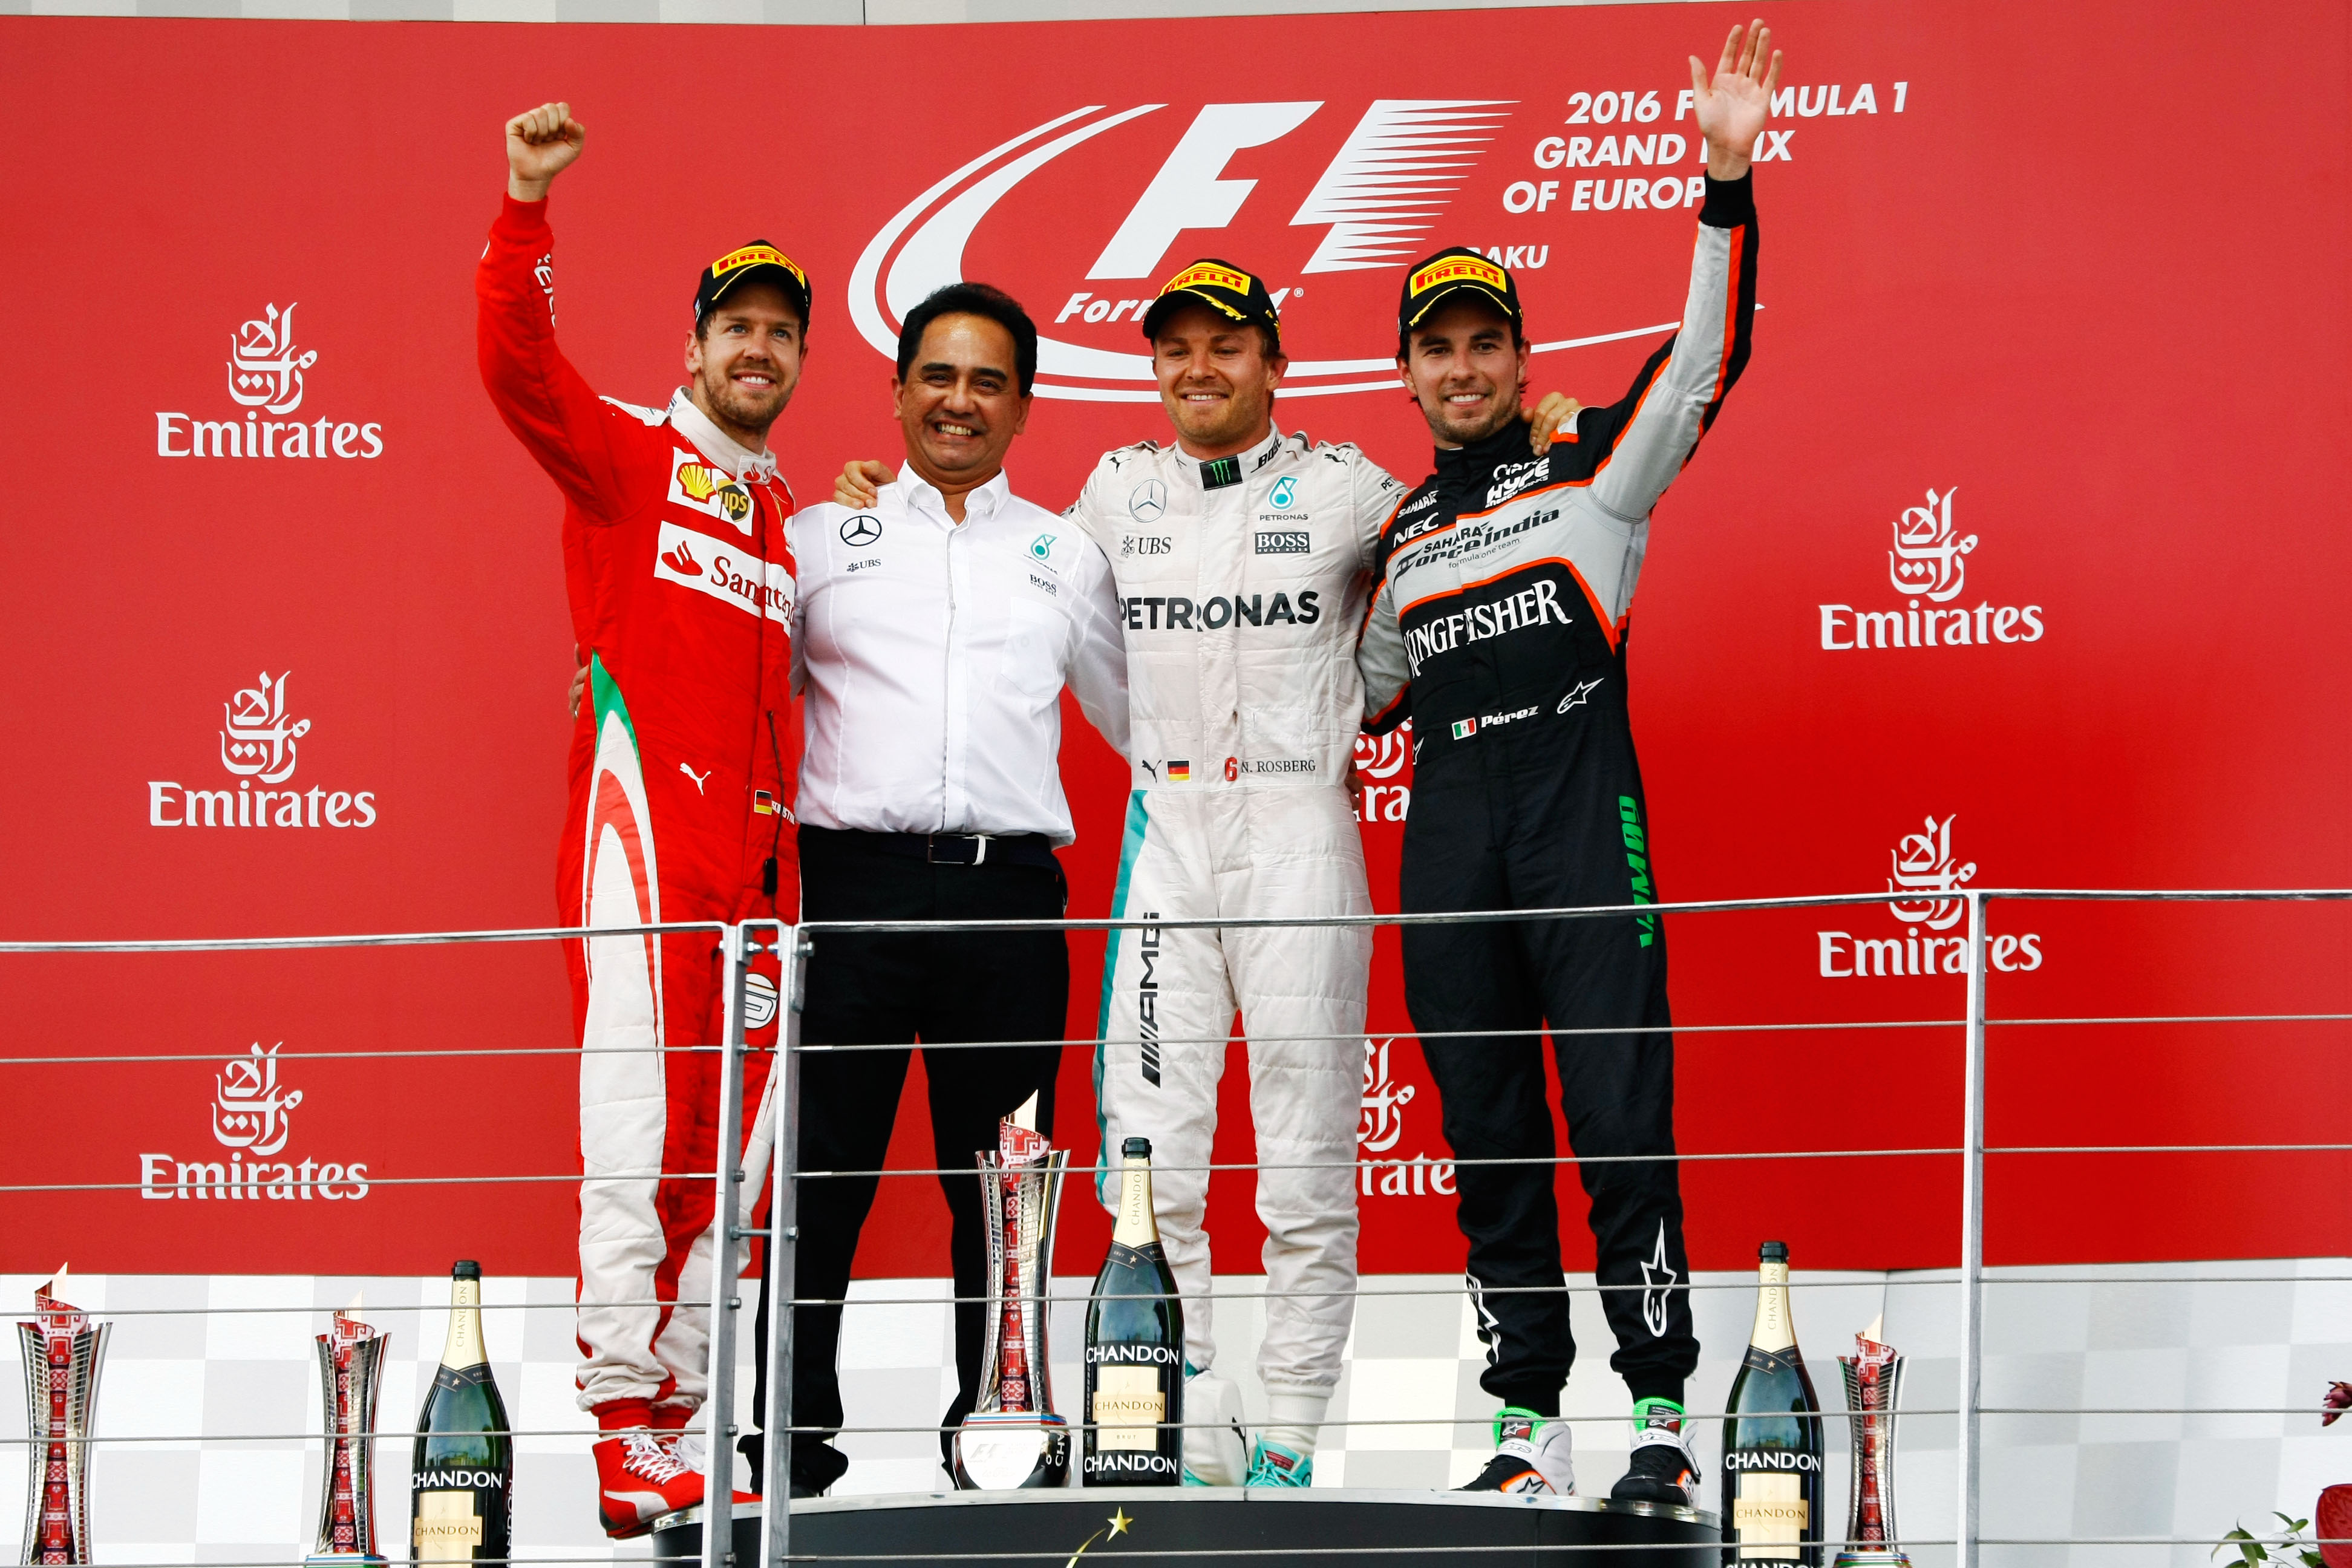 2016 European F1 GP podium 1. Rosberg 2. Vettel 3. Perez